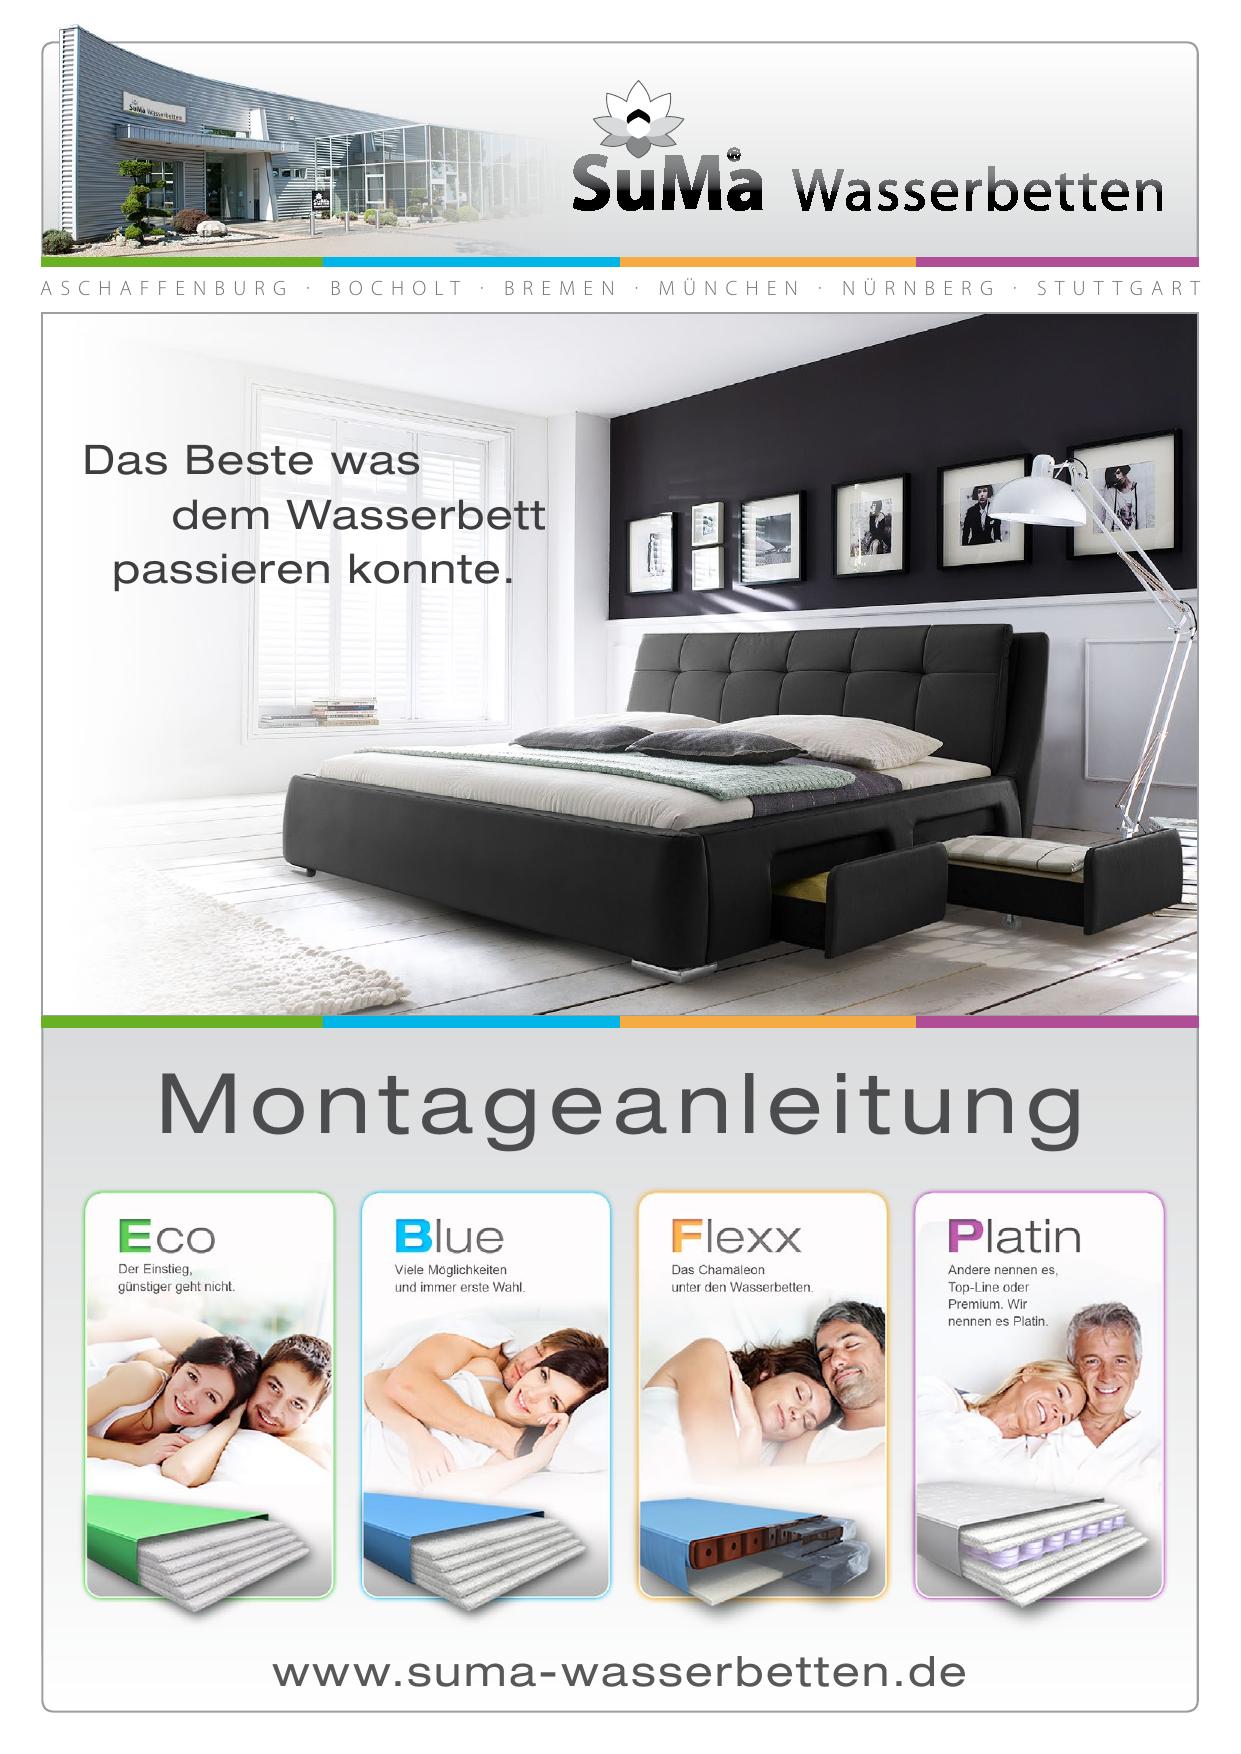 MontageanleitungMontageanleitung | manualzz.com